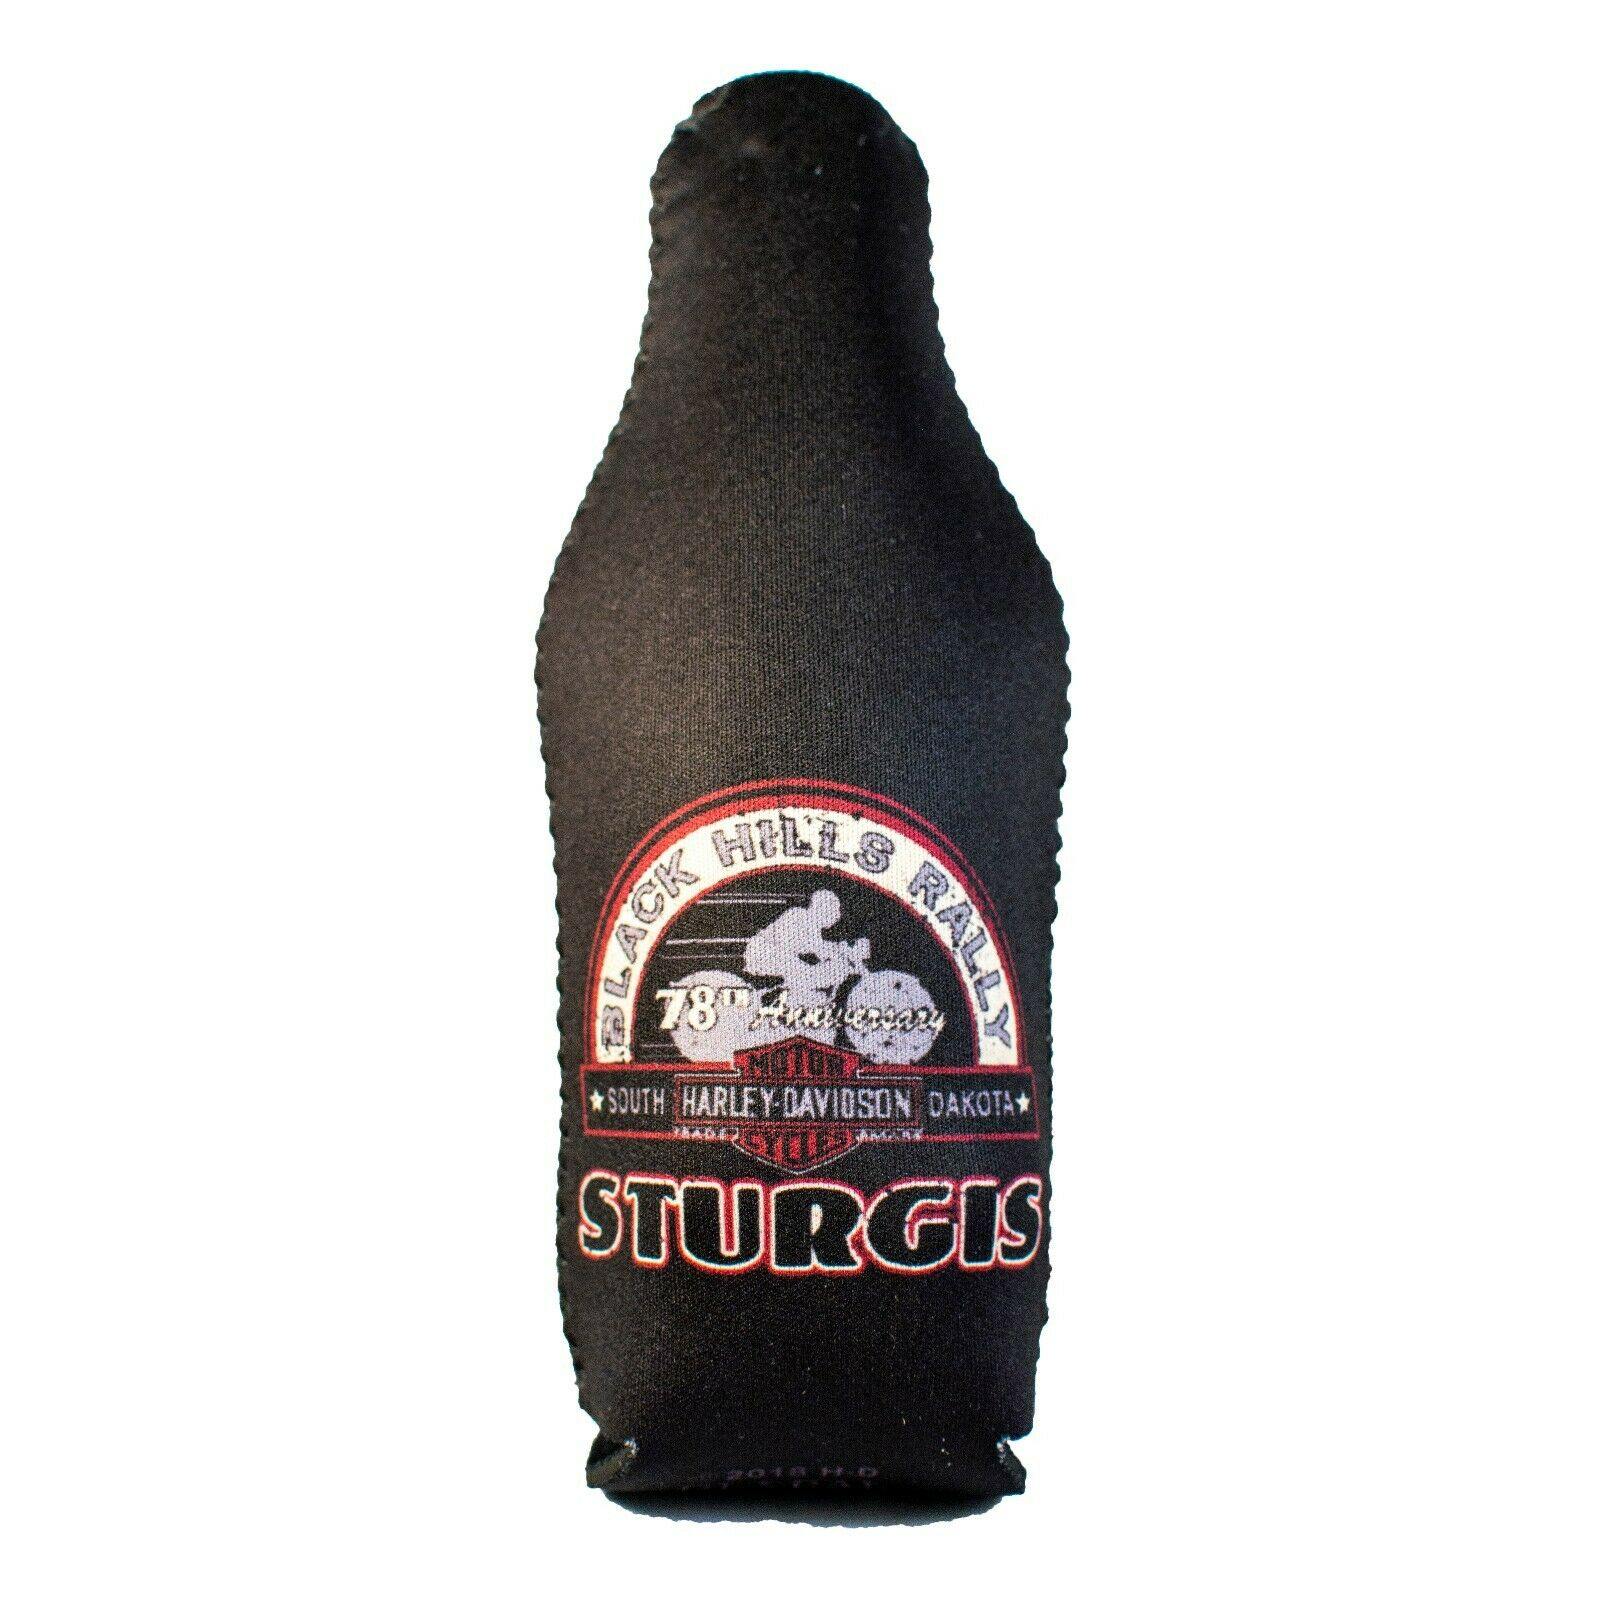 HARLEY-DAVIDSON Sturgis Patriotic Zip Bottle Coozie